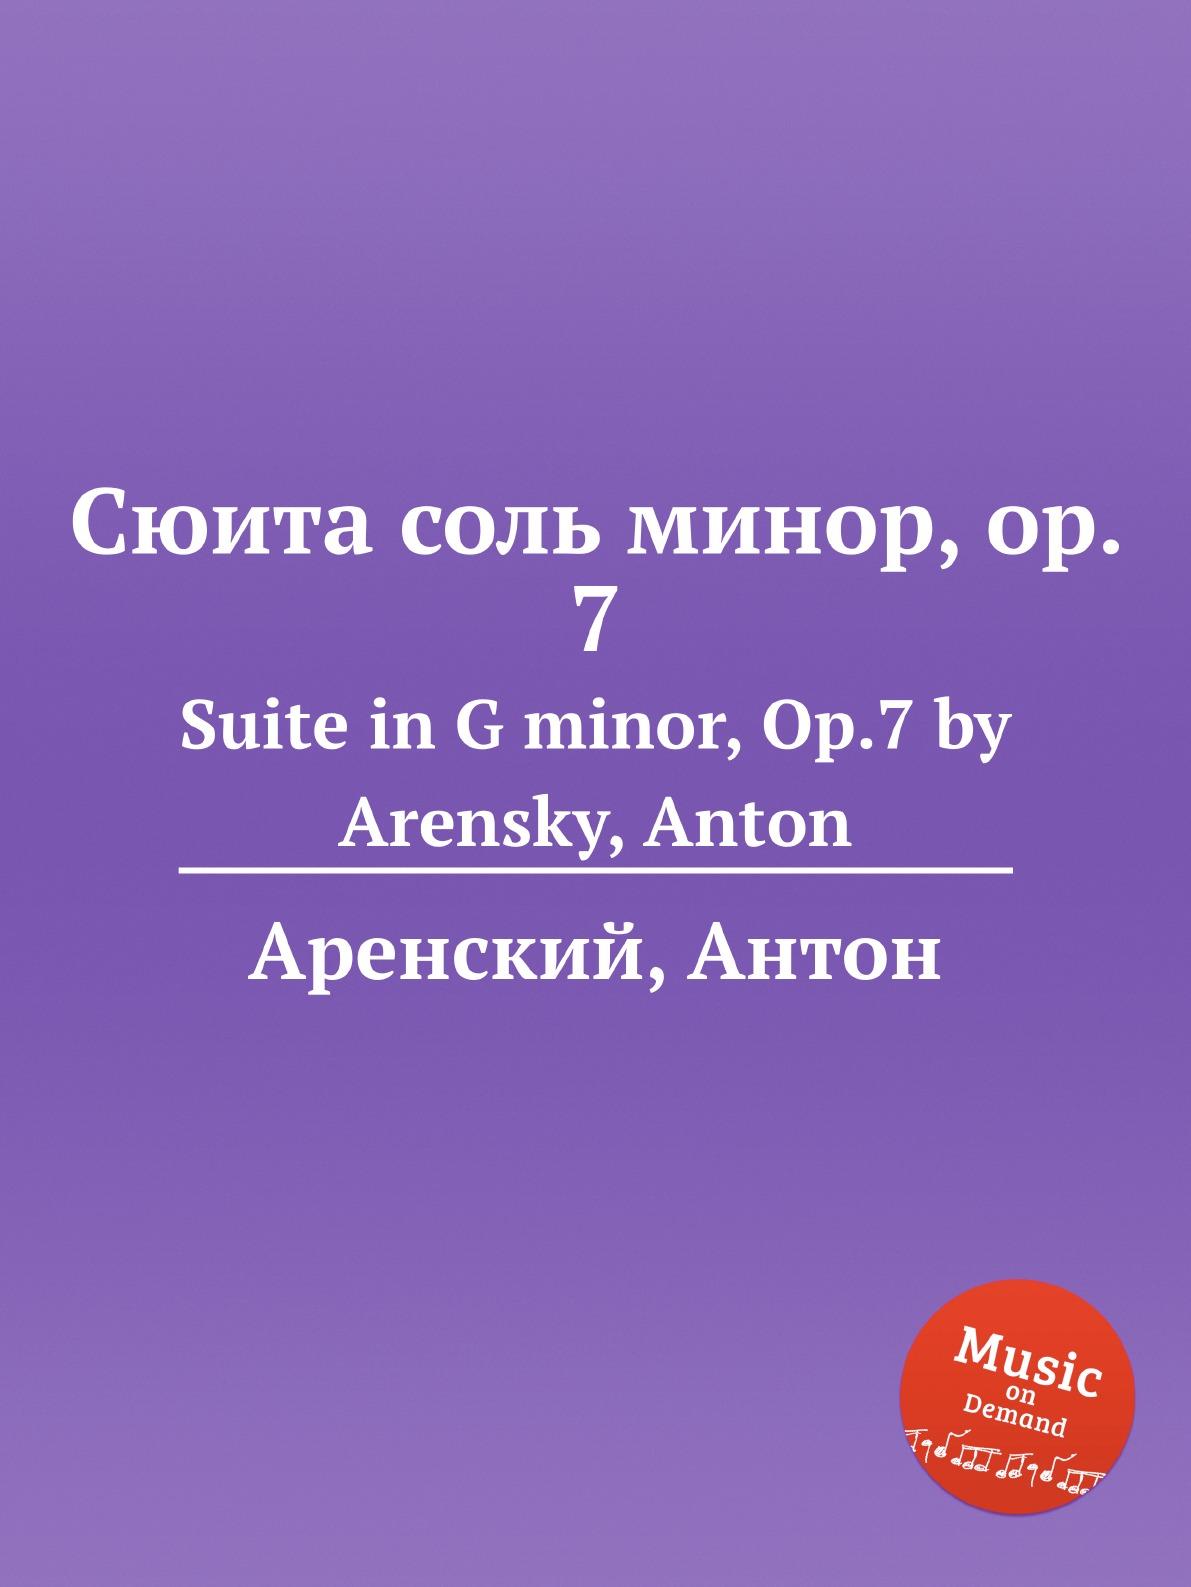 Антон Аренский Сюита соль минор, op. 7. Suite in G minor, Op.7 by Arensky, Anton